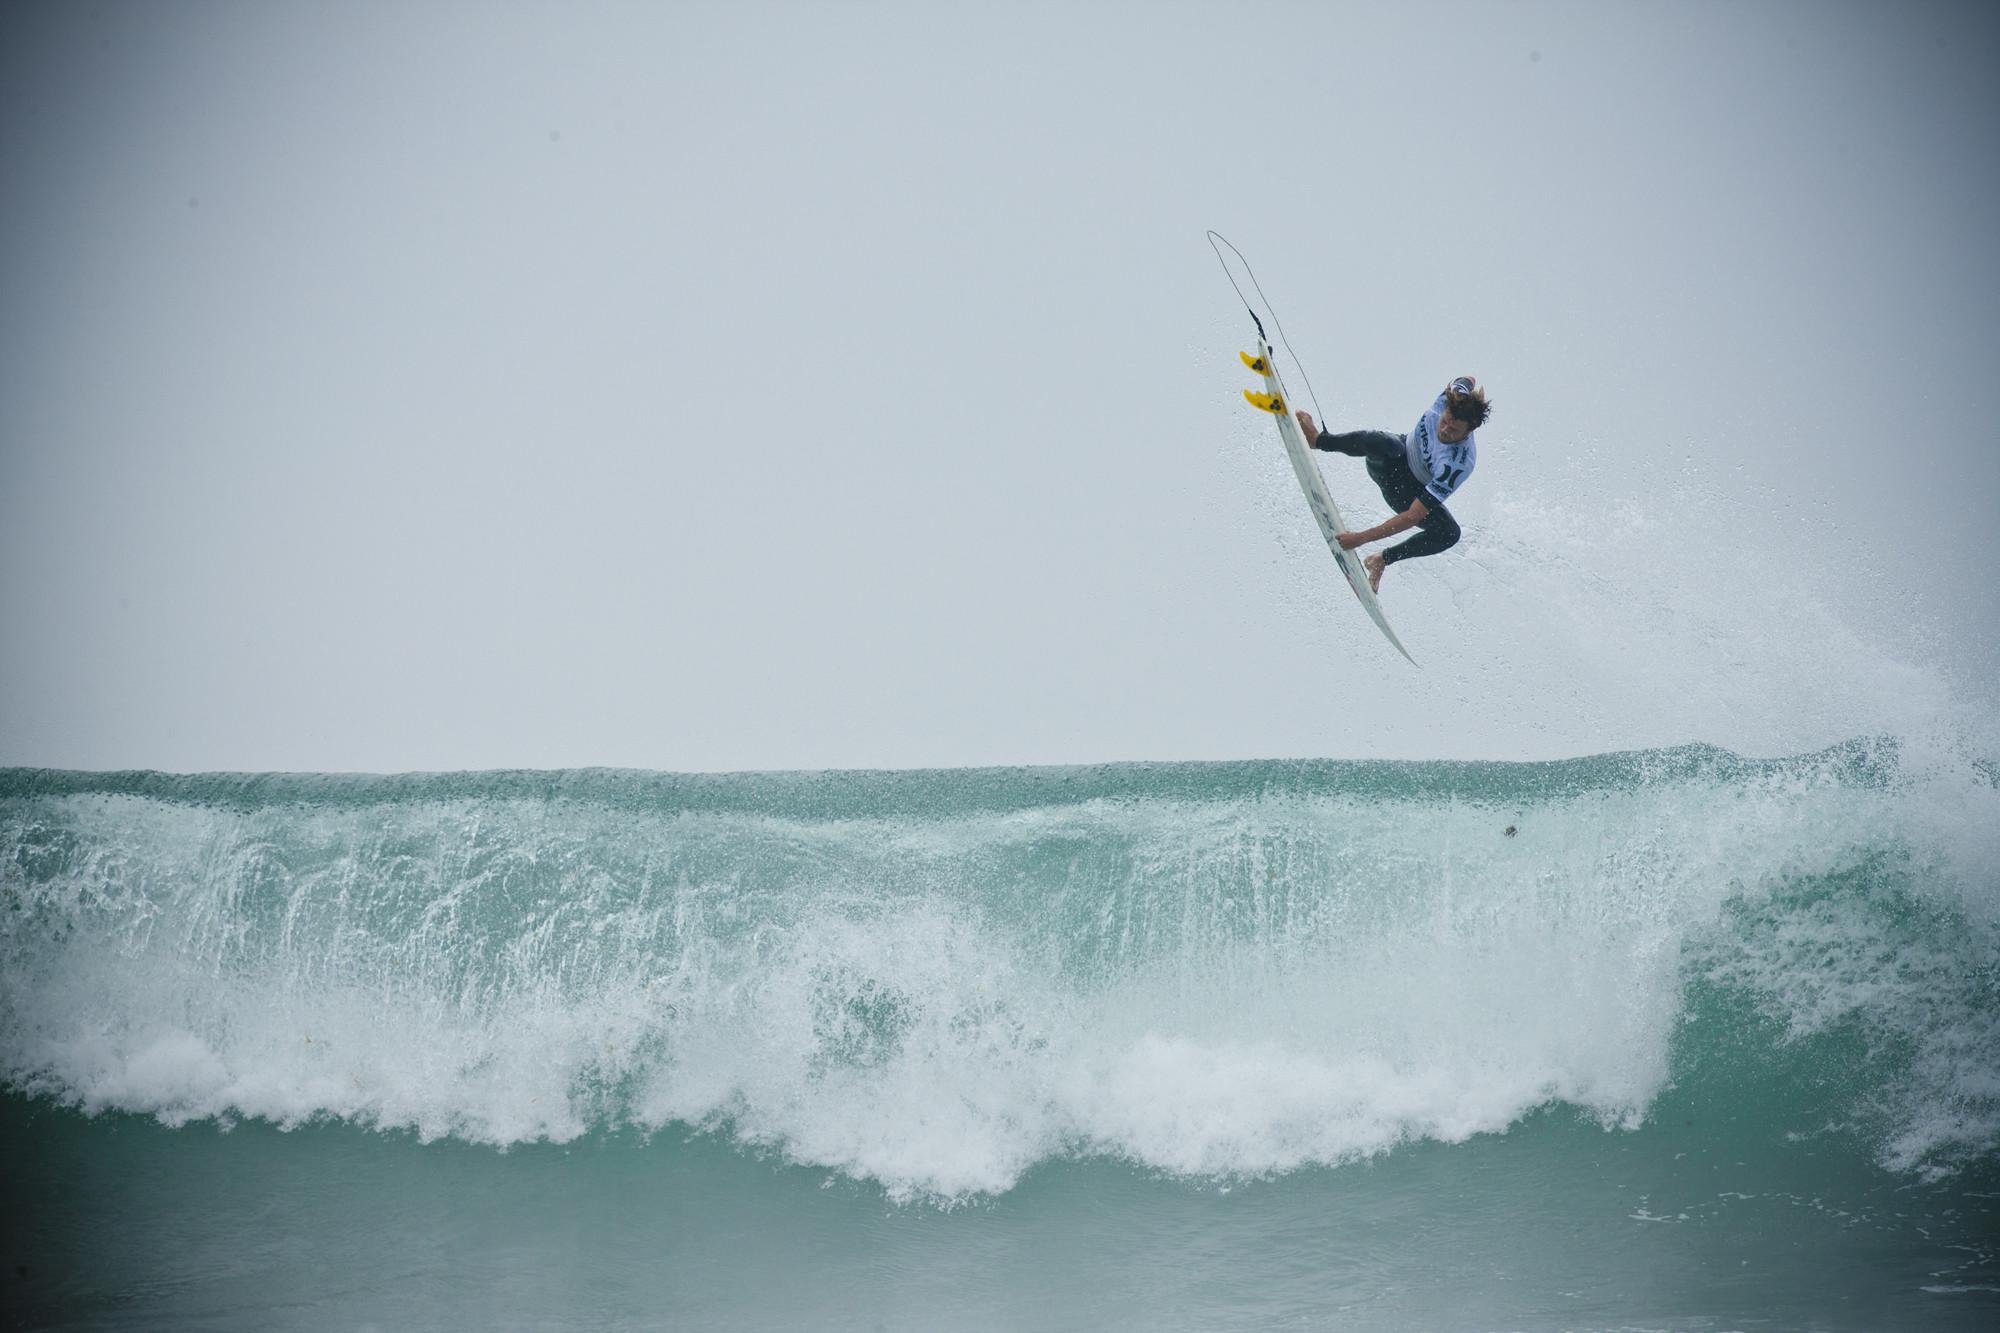 surf wallpaper hurley dane reynolds 610×406 Hurley Surf Wallpaper